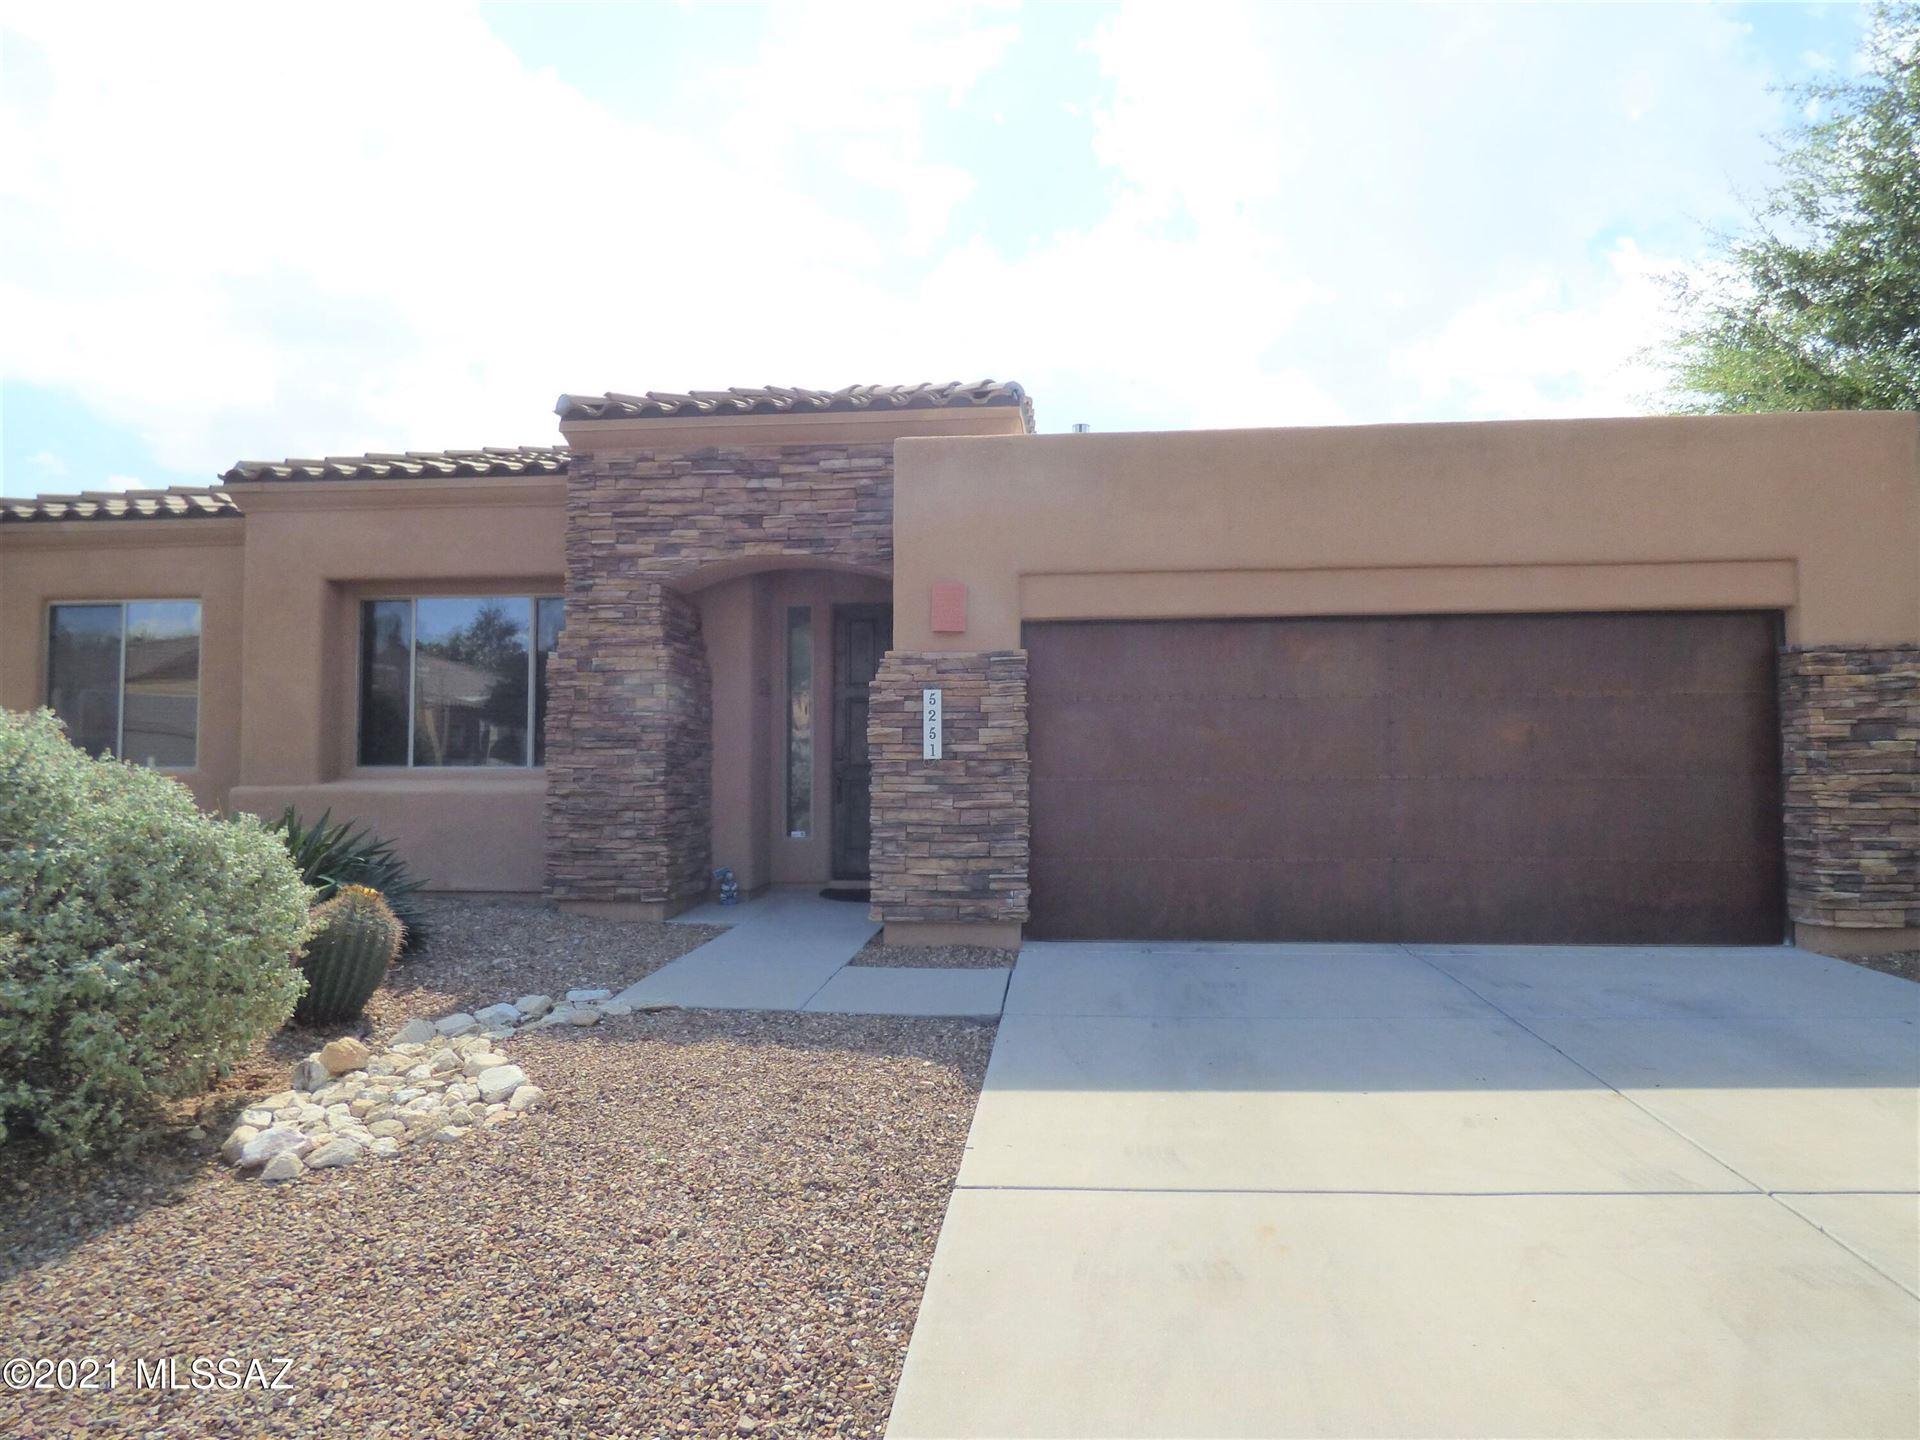 5251 N Spring Canyon Place, Tucson, AZ 85749 - MLS#: 22124231